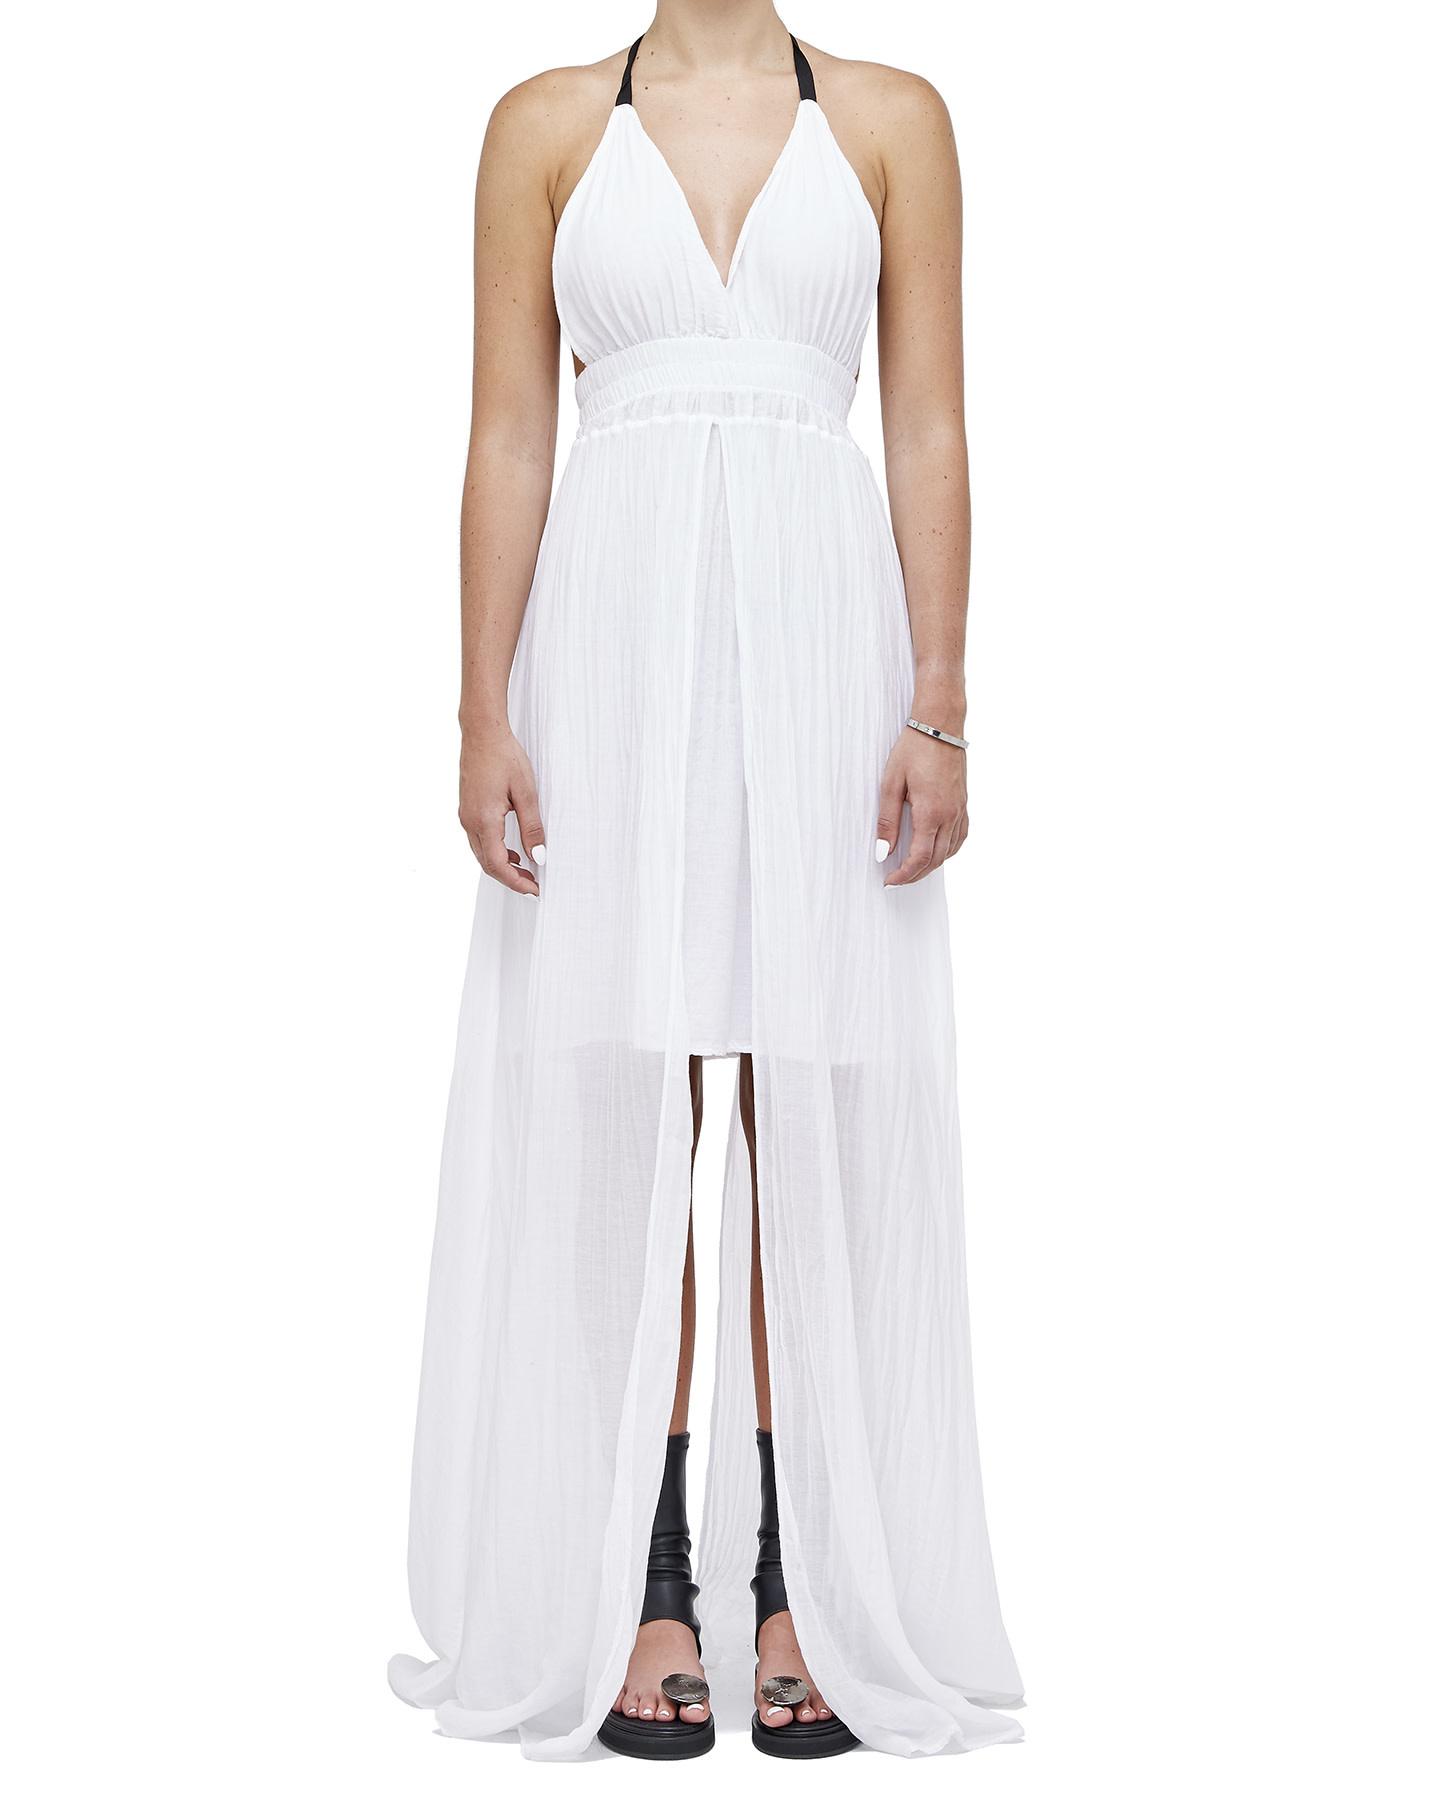 COTTON & SILK GAUZE LAYERED DRESS - WHITE